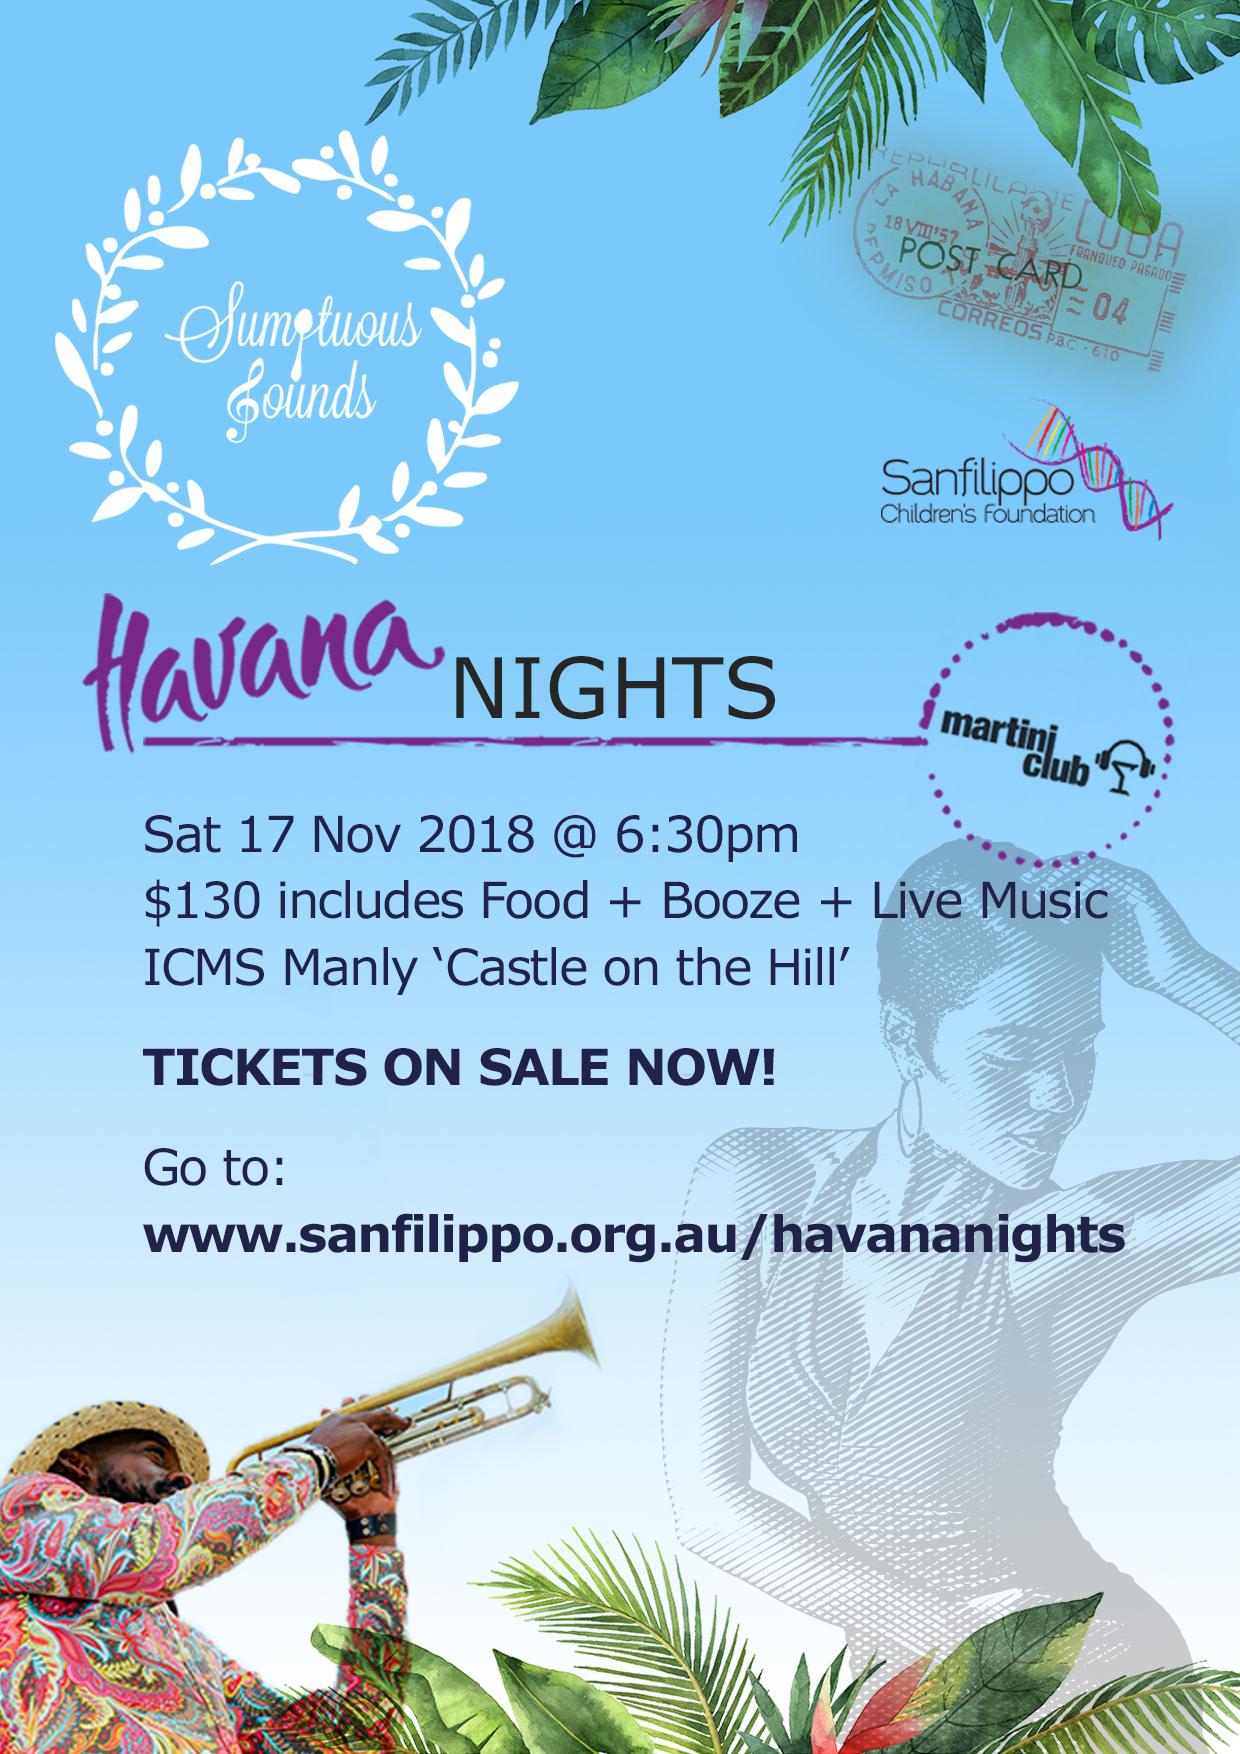 A6-Flyer-Havana-Nights (1) (1).jpg